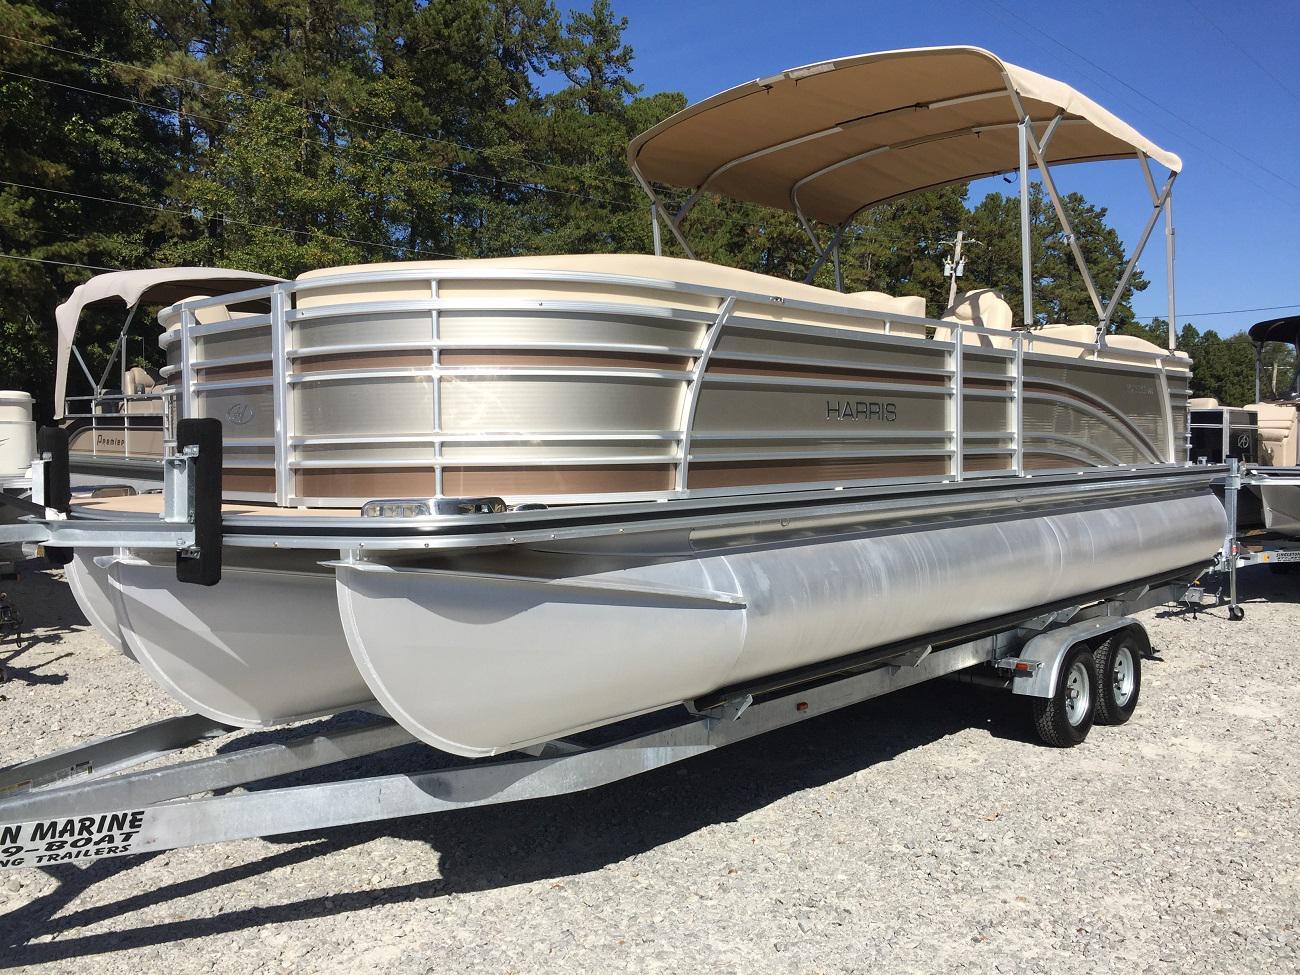 admiral bentley in dealers outboard boats power fl elite pontoon new pontoons stuart florida